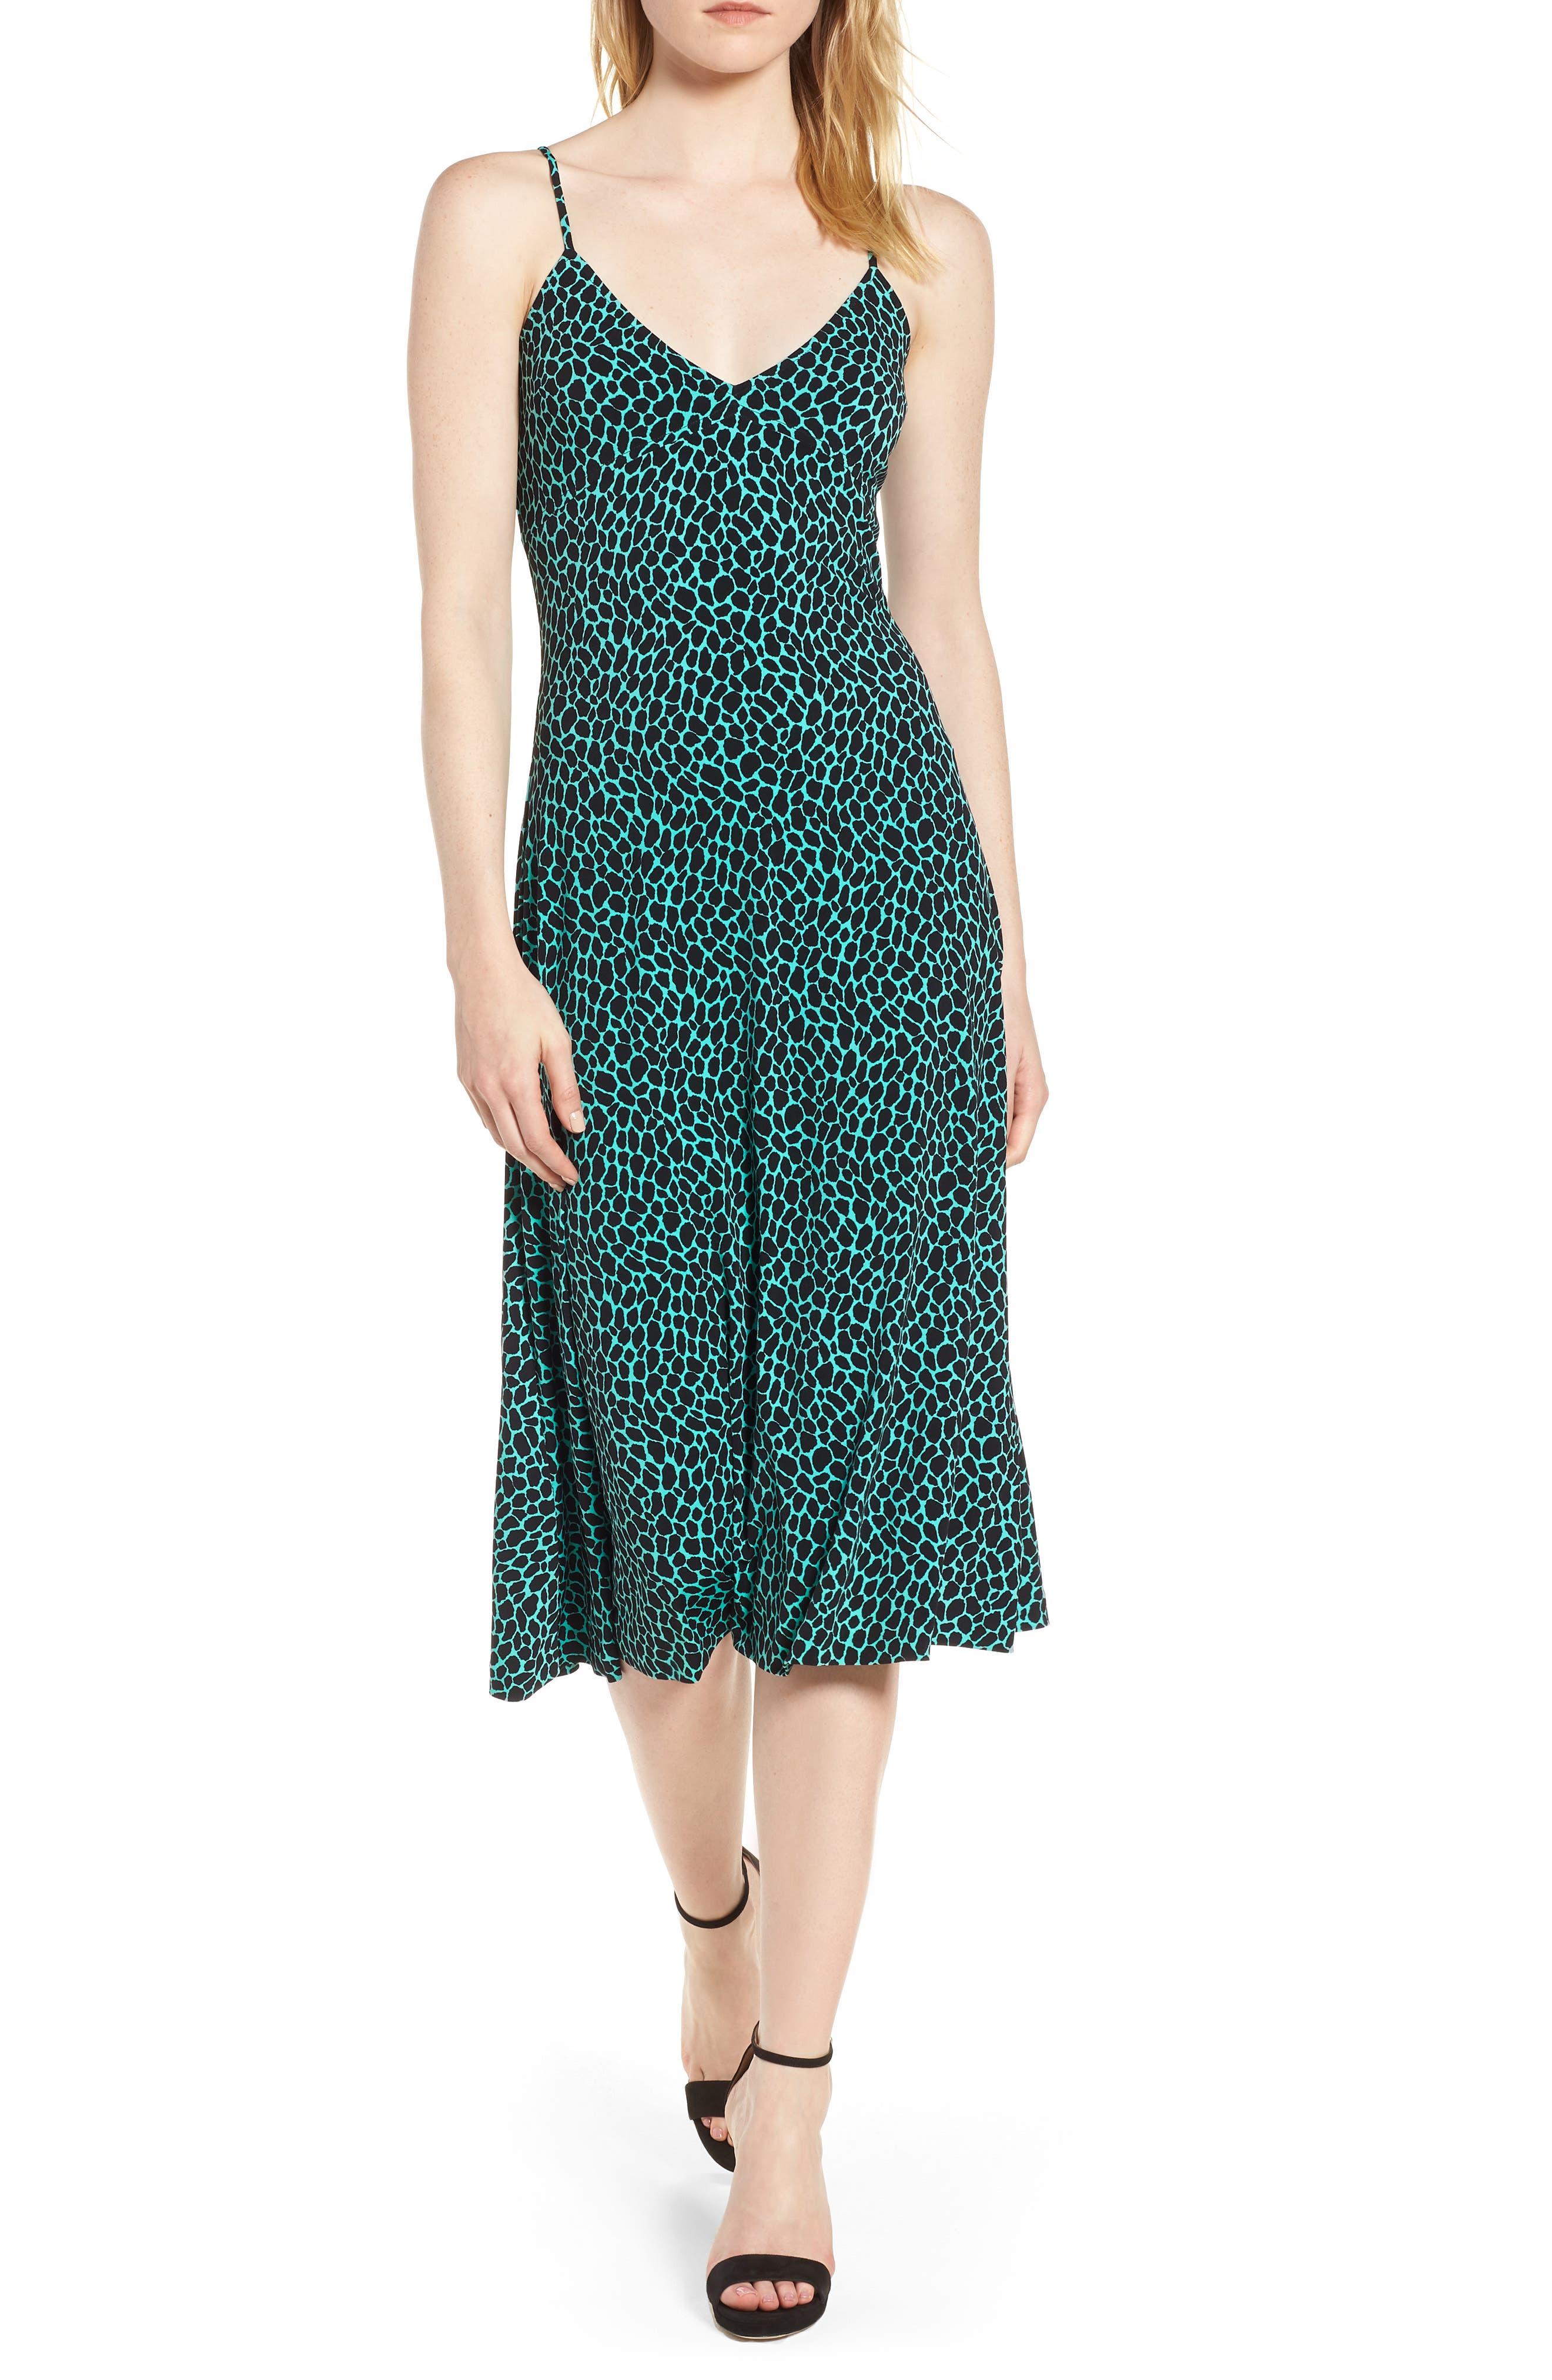 Graphic Leopard Tank Midi Dress,                             Main thumbnail 1, color,